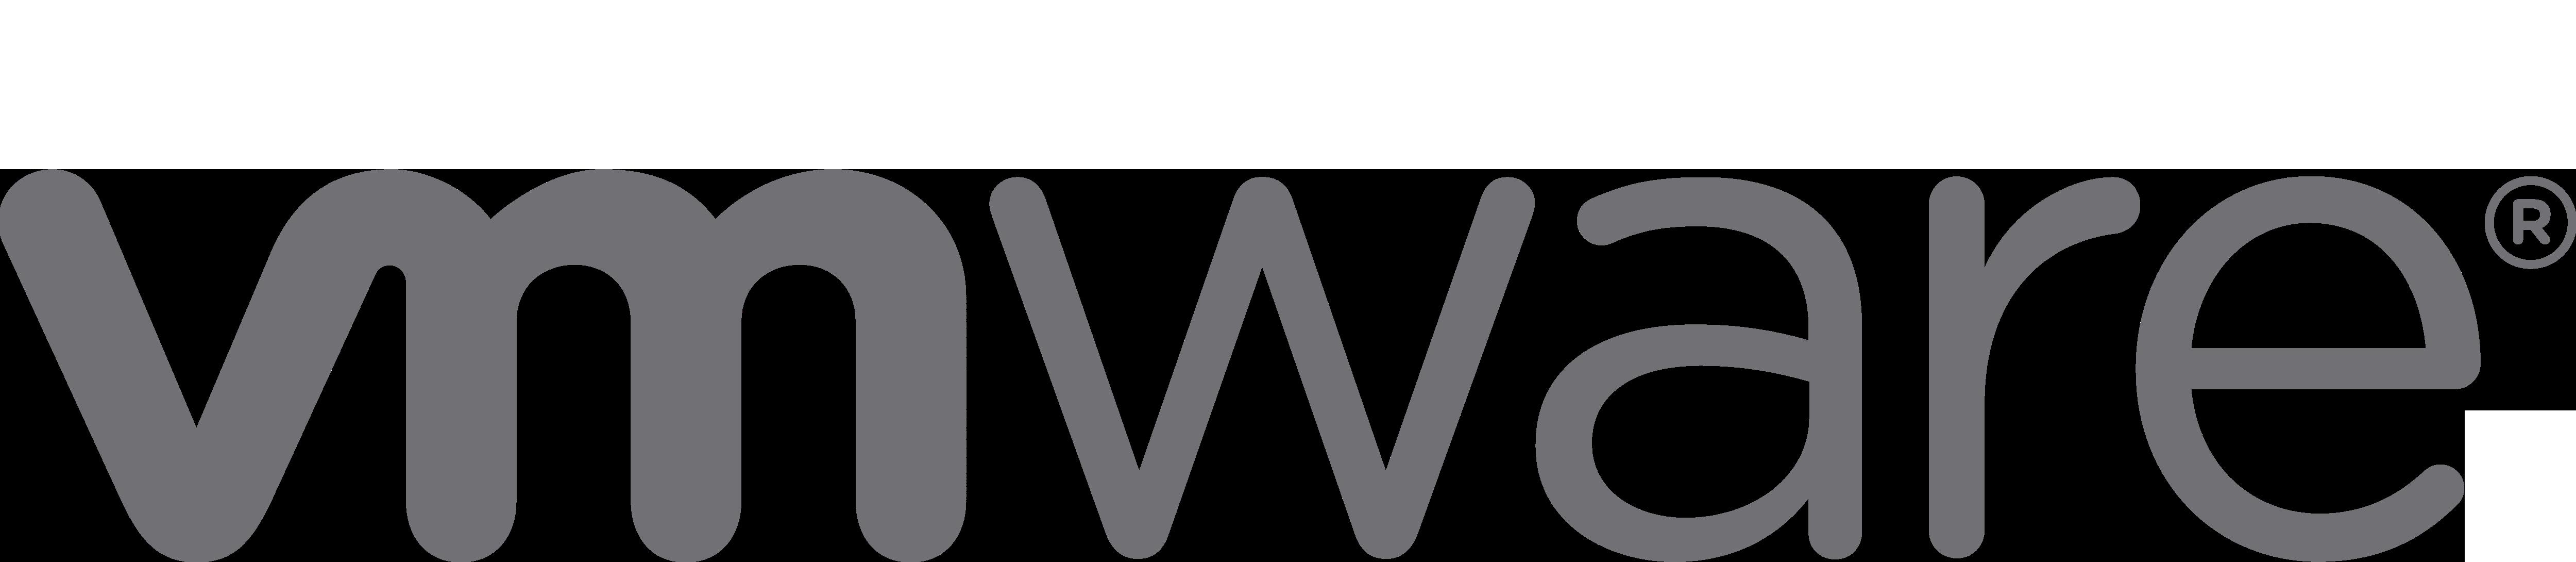 Vmware VirtualCenter logo